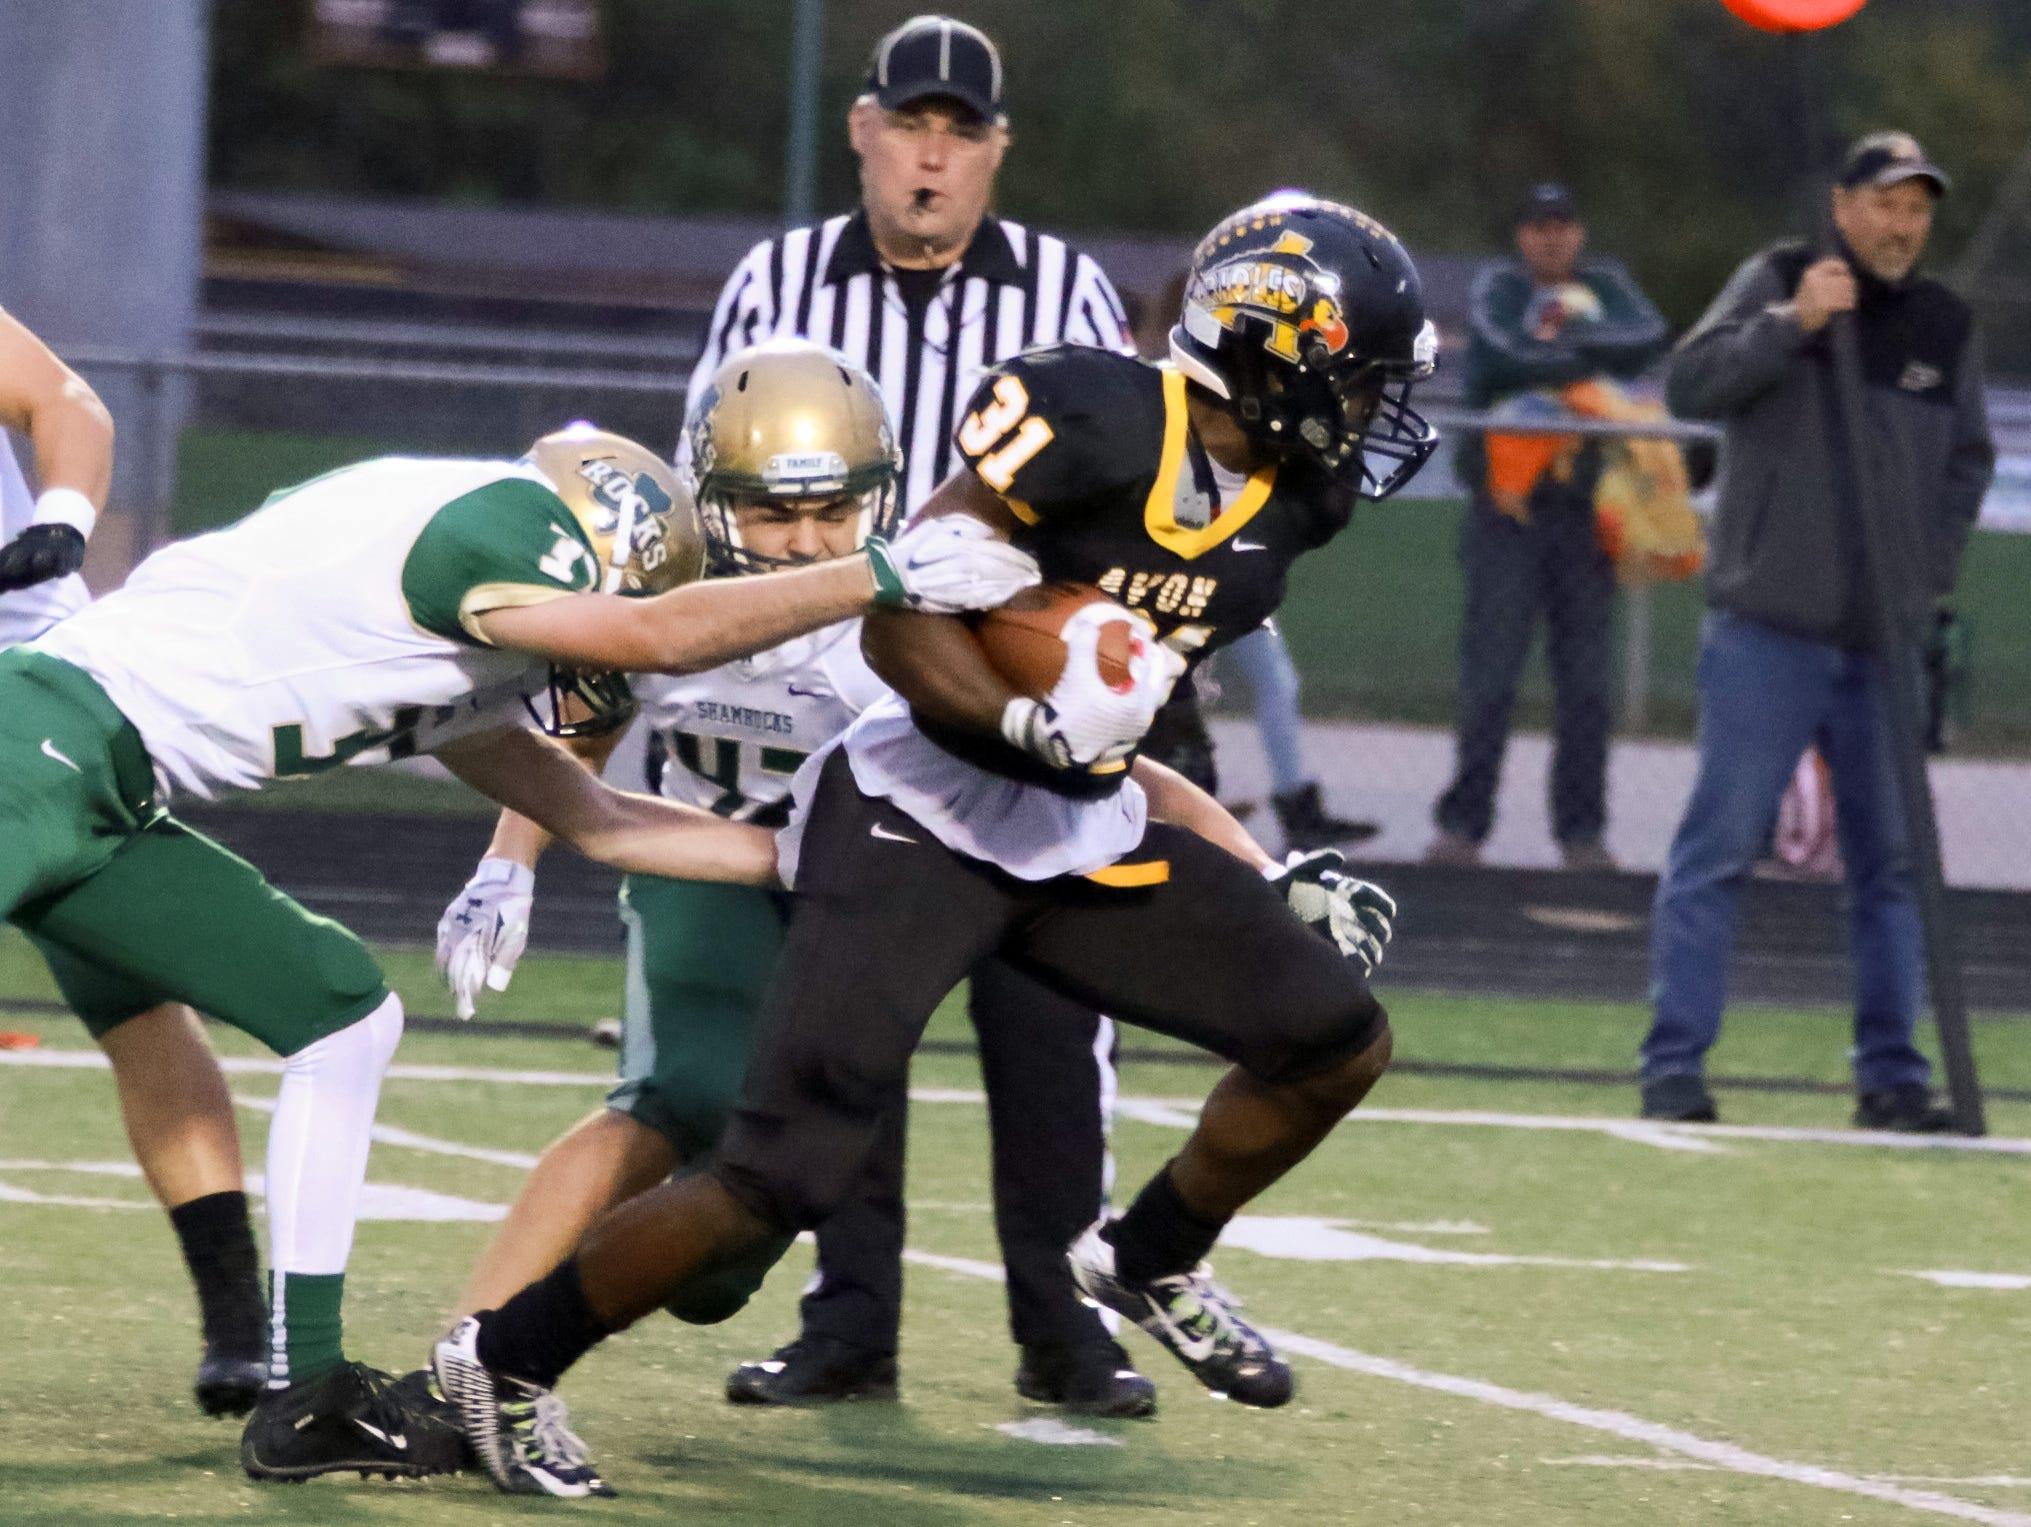 High school football: Avon vs. Westfield